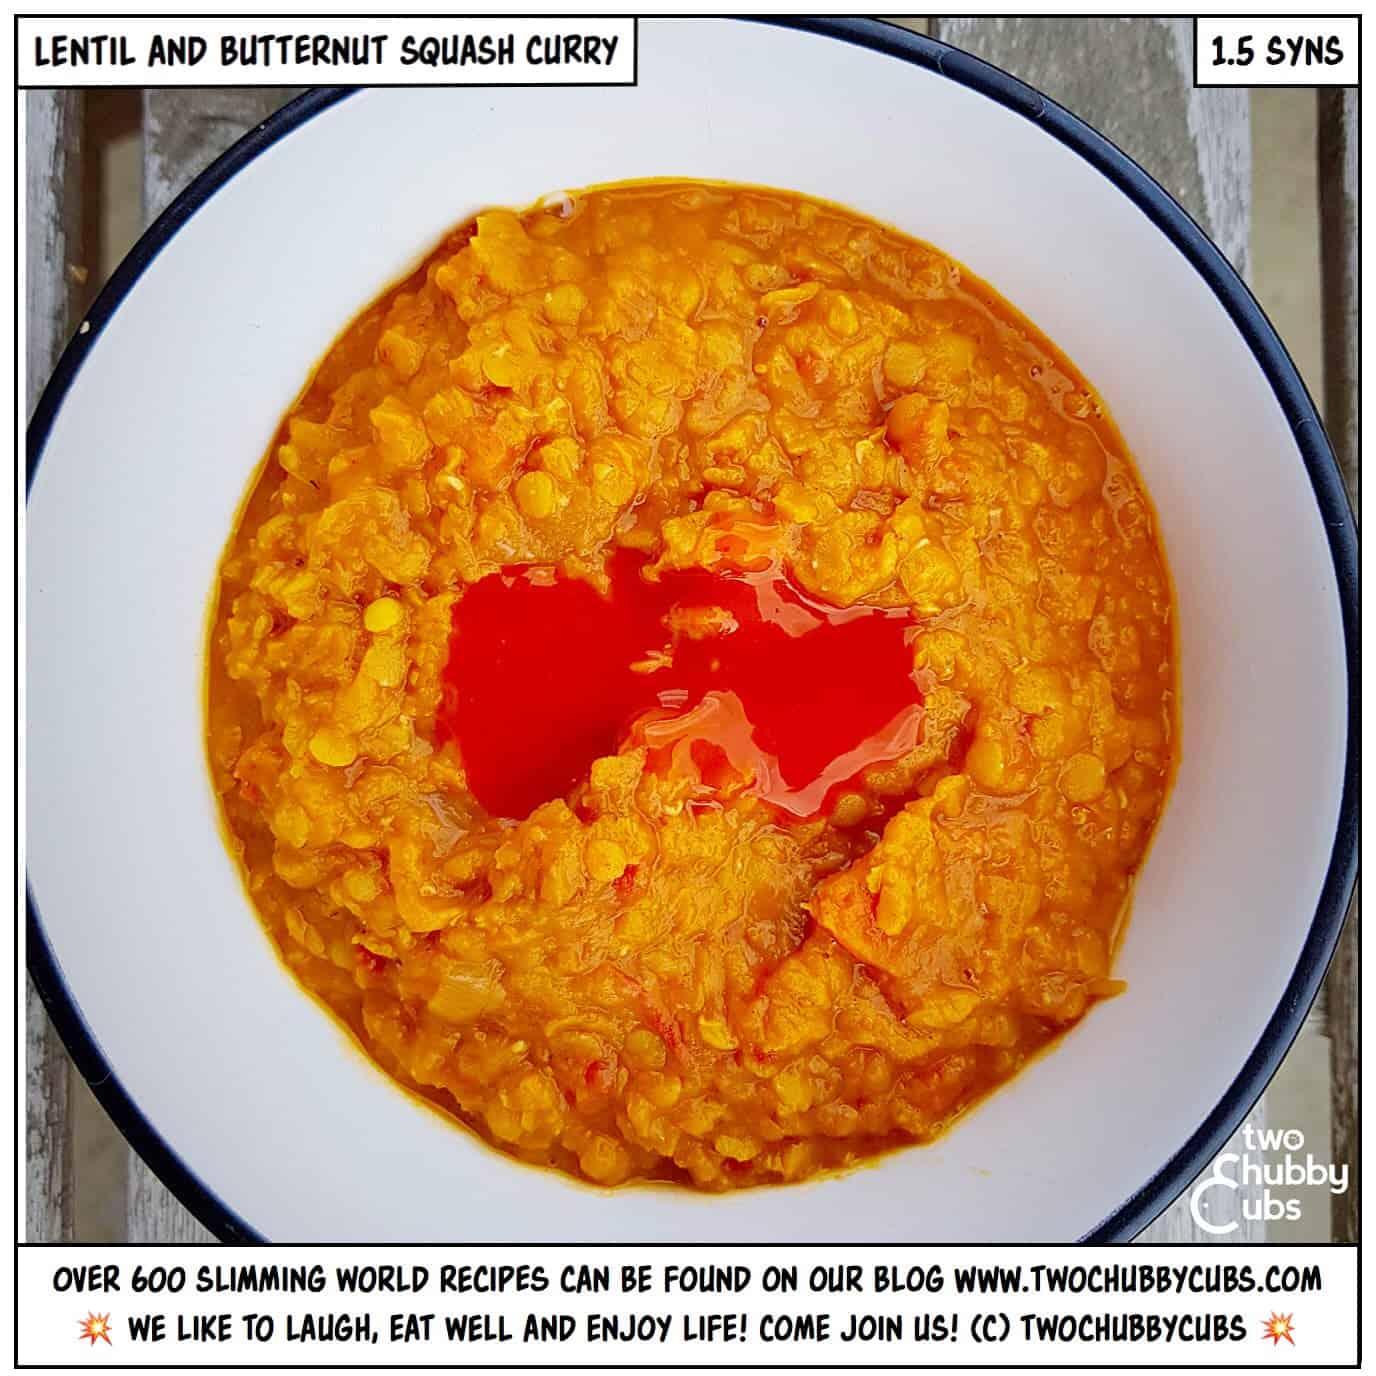 Lentil Butternut Squash Curry